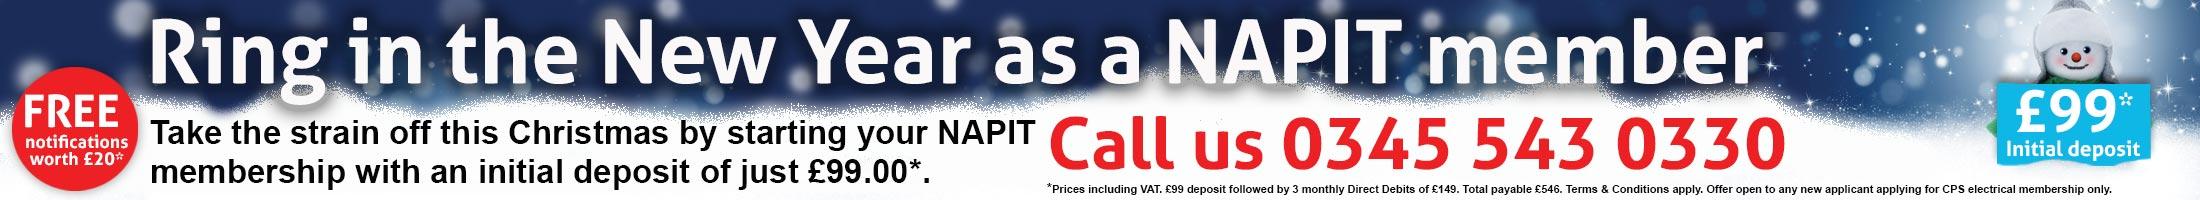 NAPIT Xmas offer